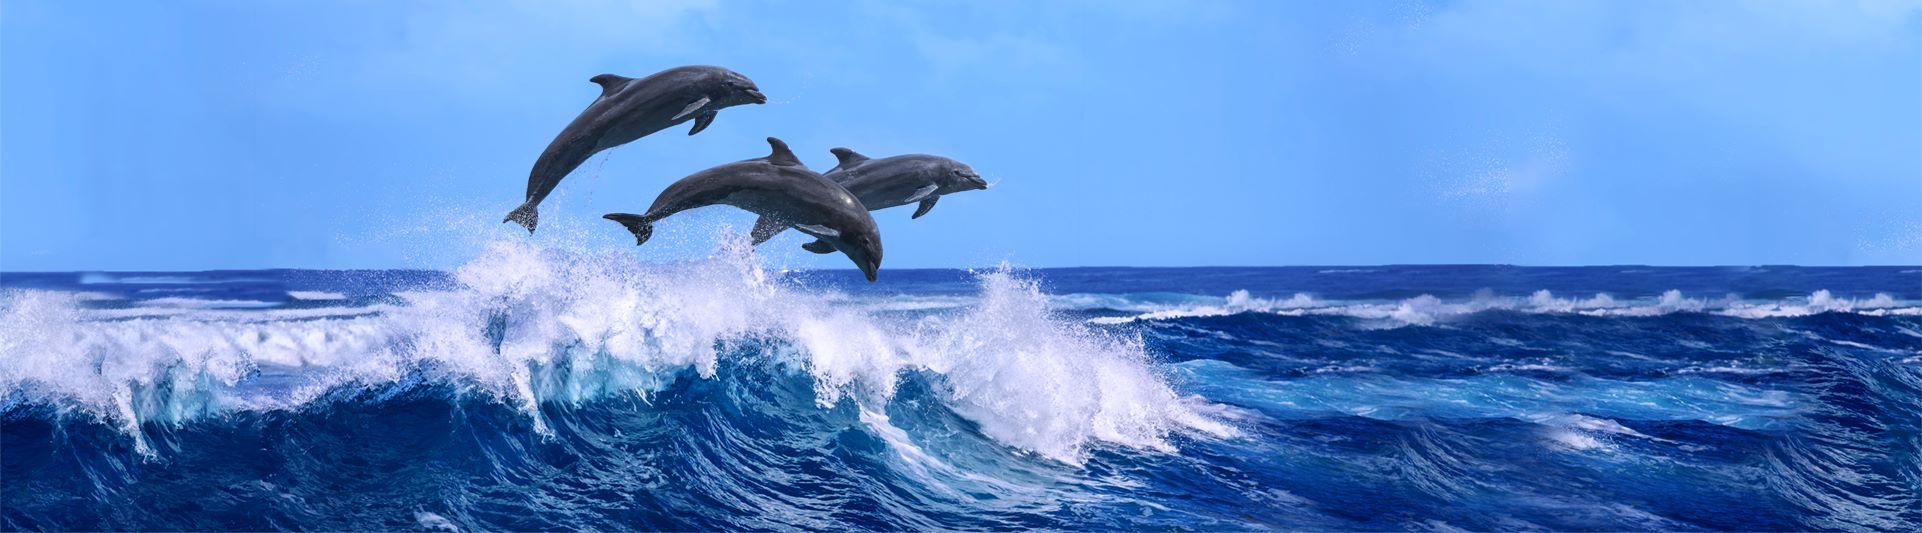 Dolphins - DynamicGroupSync